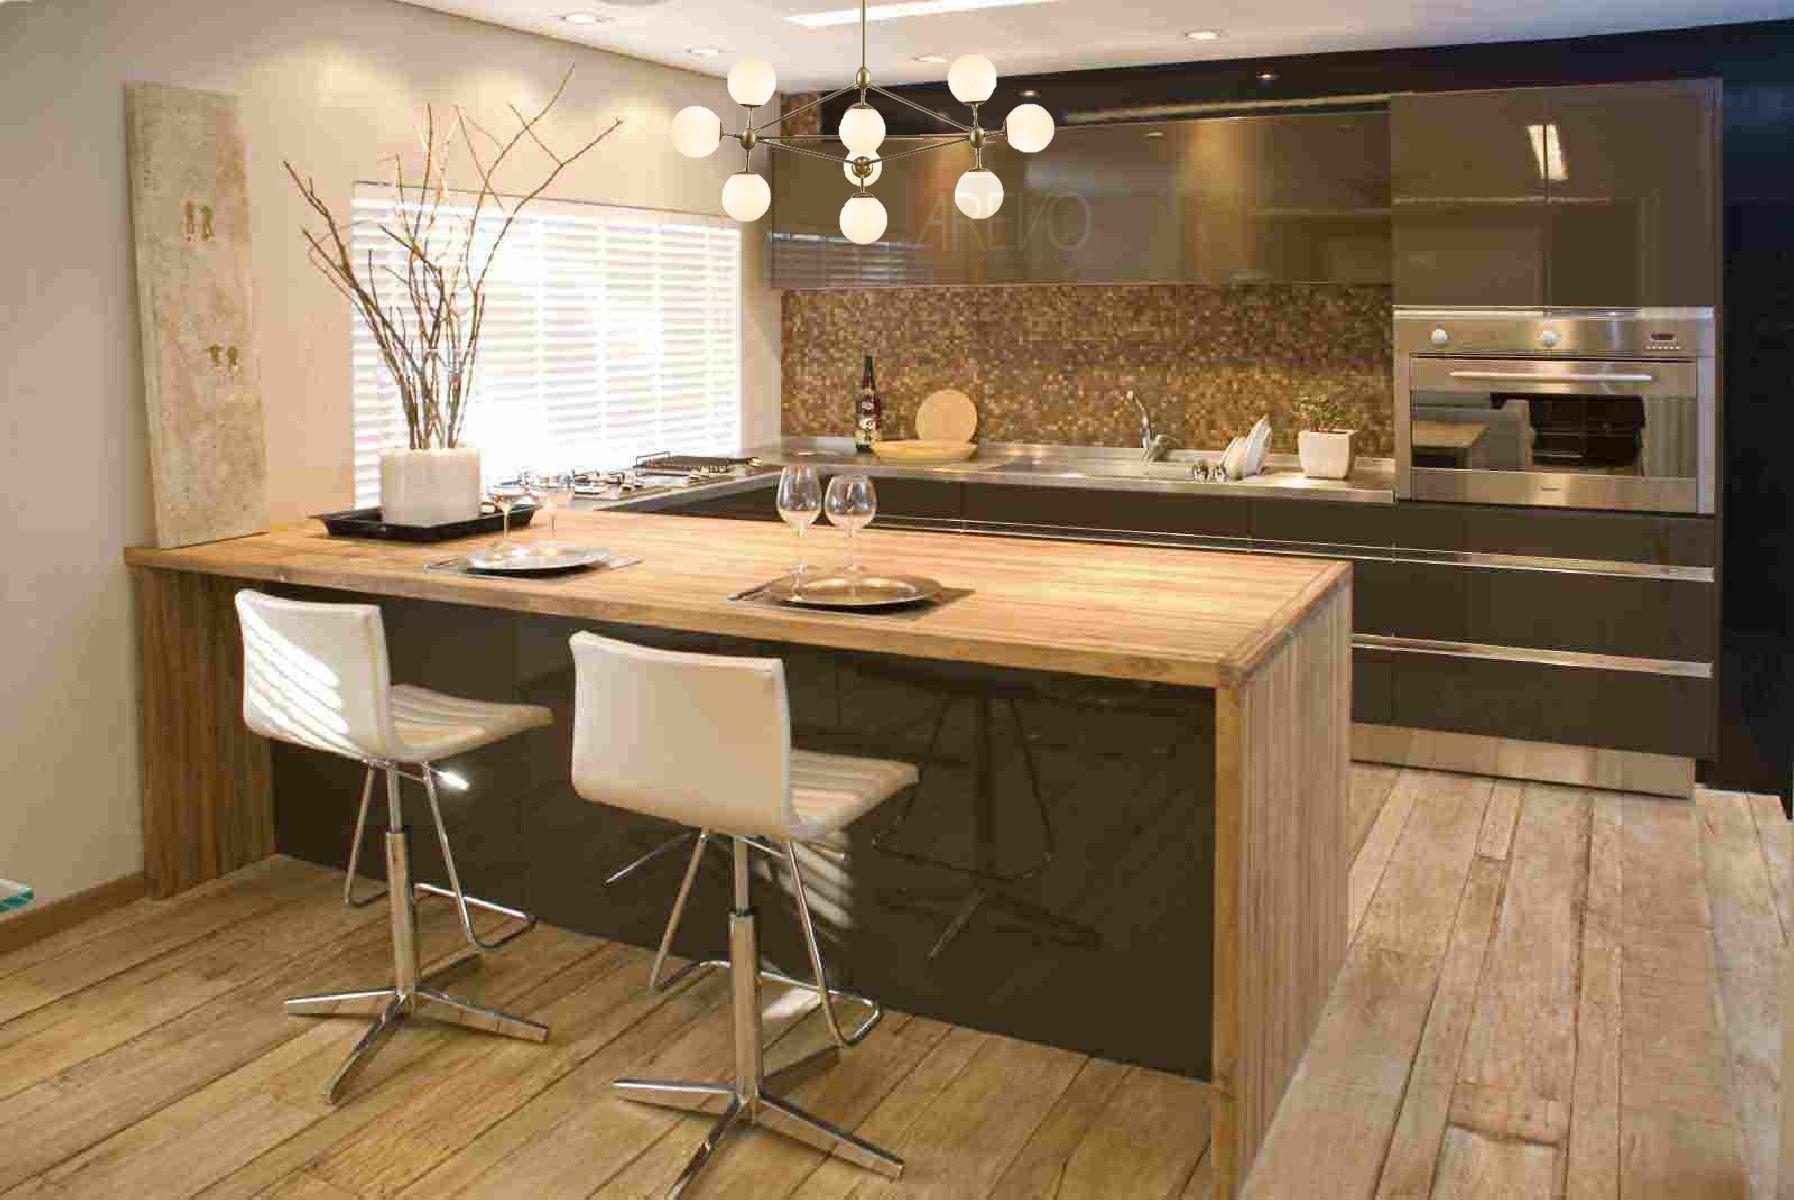 Pendente Moderno Jabuticaba Dourado Mesa Sala Cozinha Gourmet